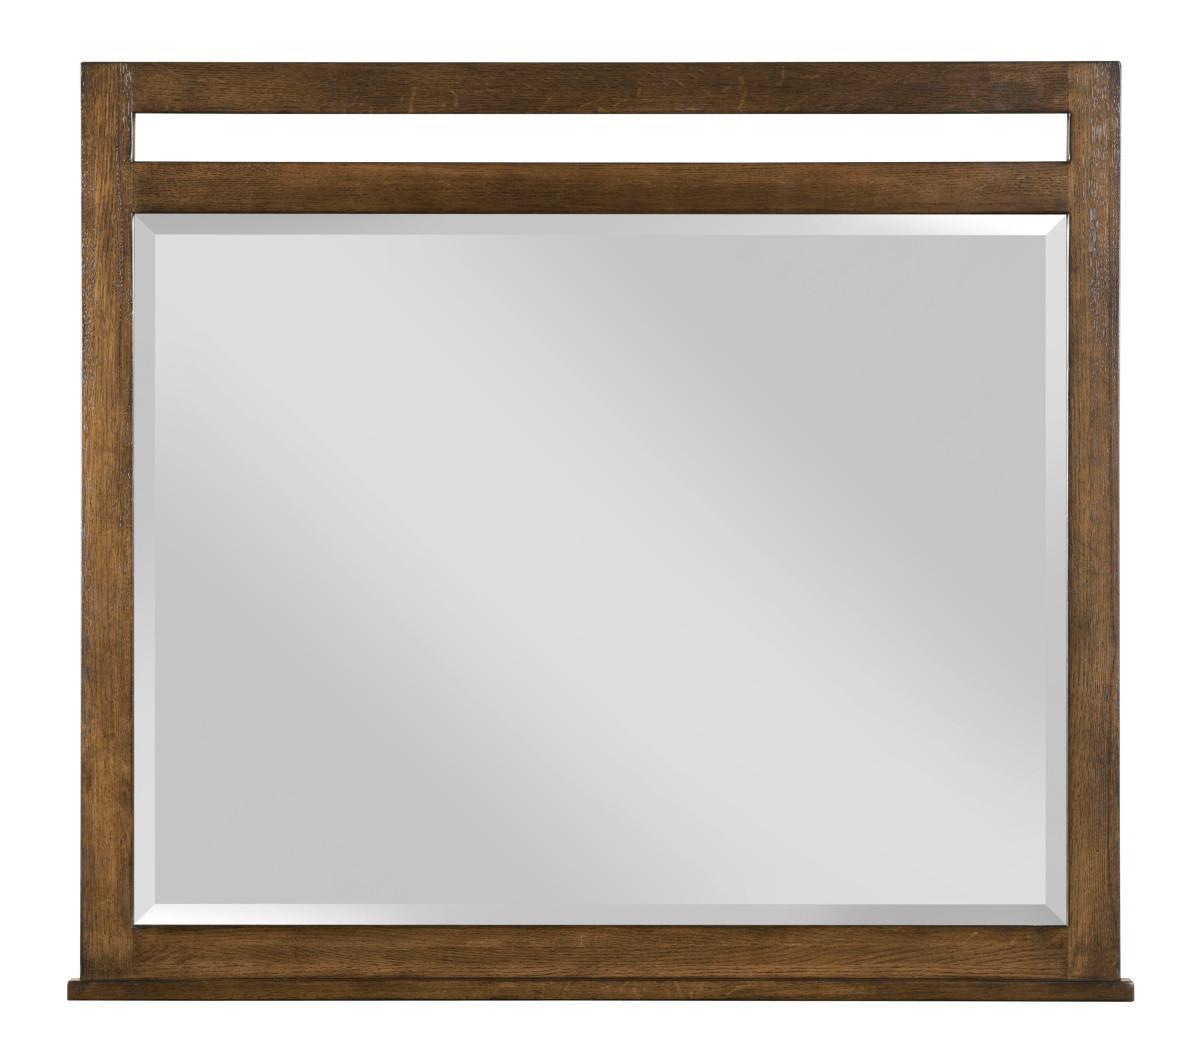 Kincaid Furniture Bedford Park Wheaton Mirror - Item Number: 74-114